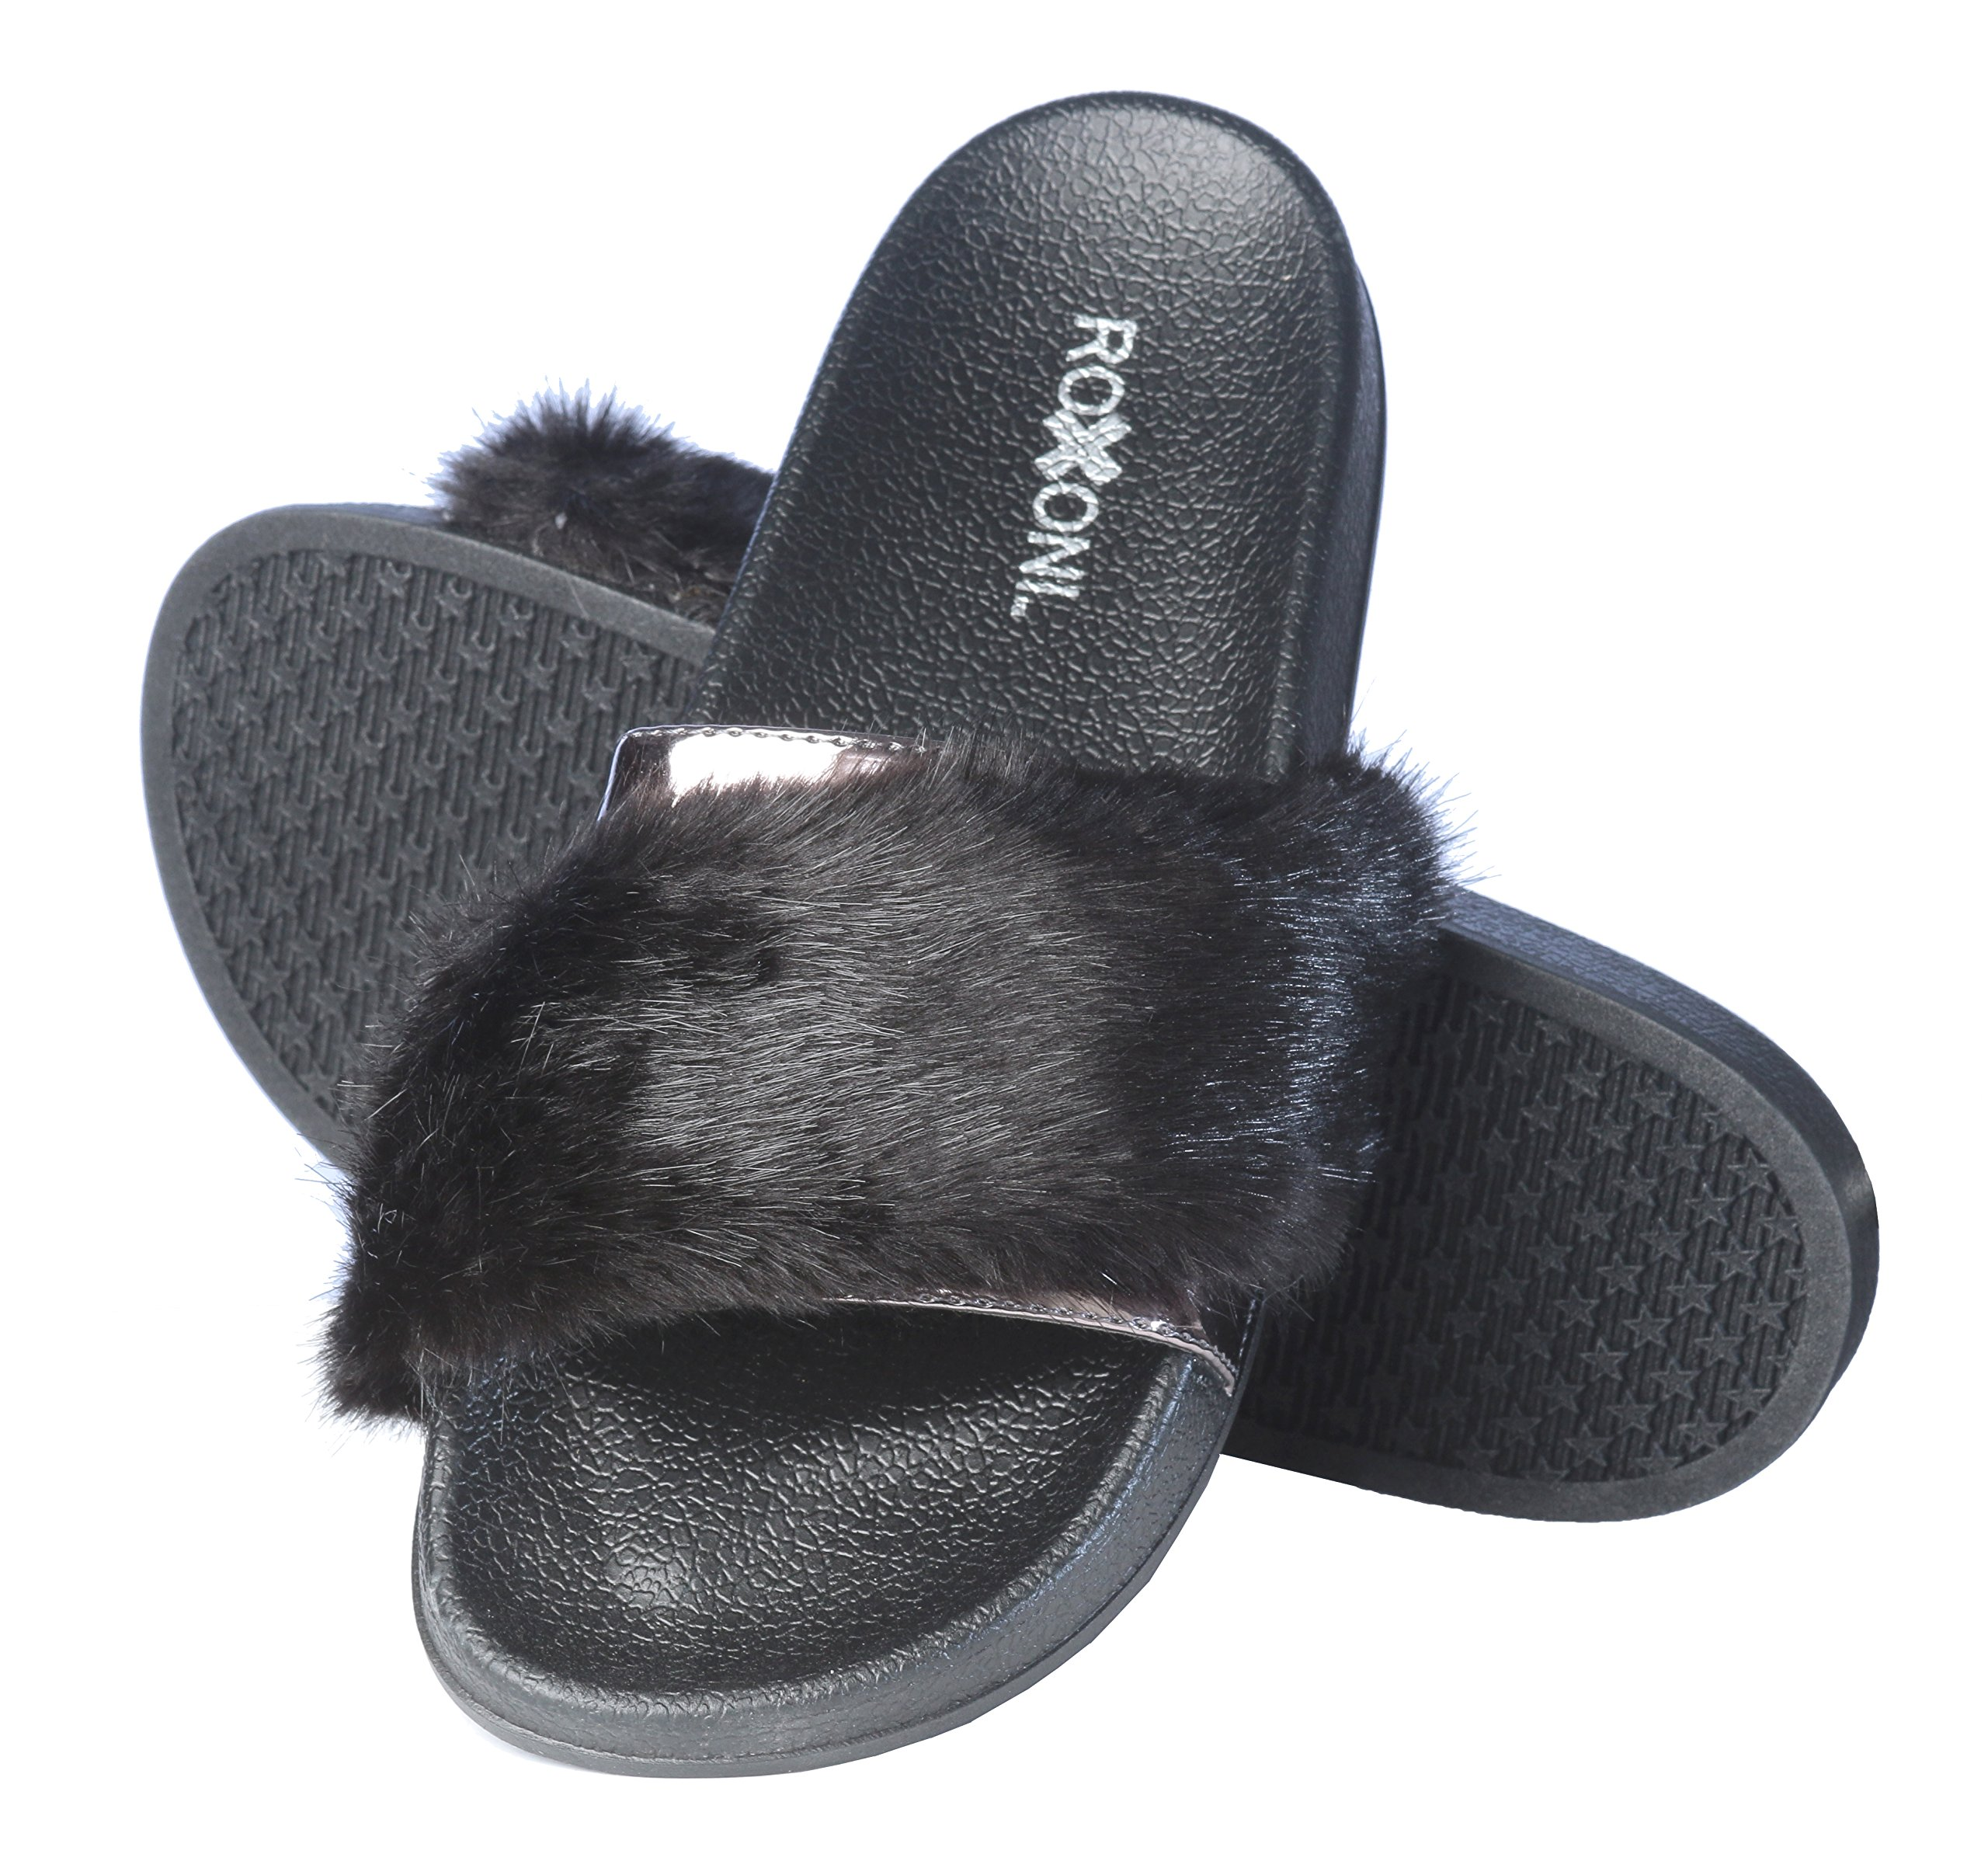 Roxoni Women's Summer Faux Fur and Metallic Open Toe Slide Sandal Slippers